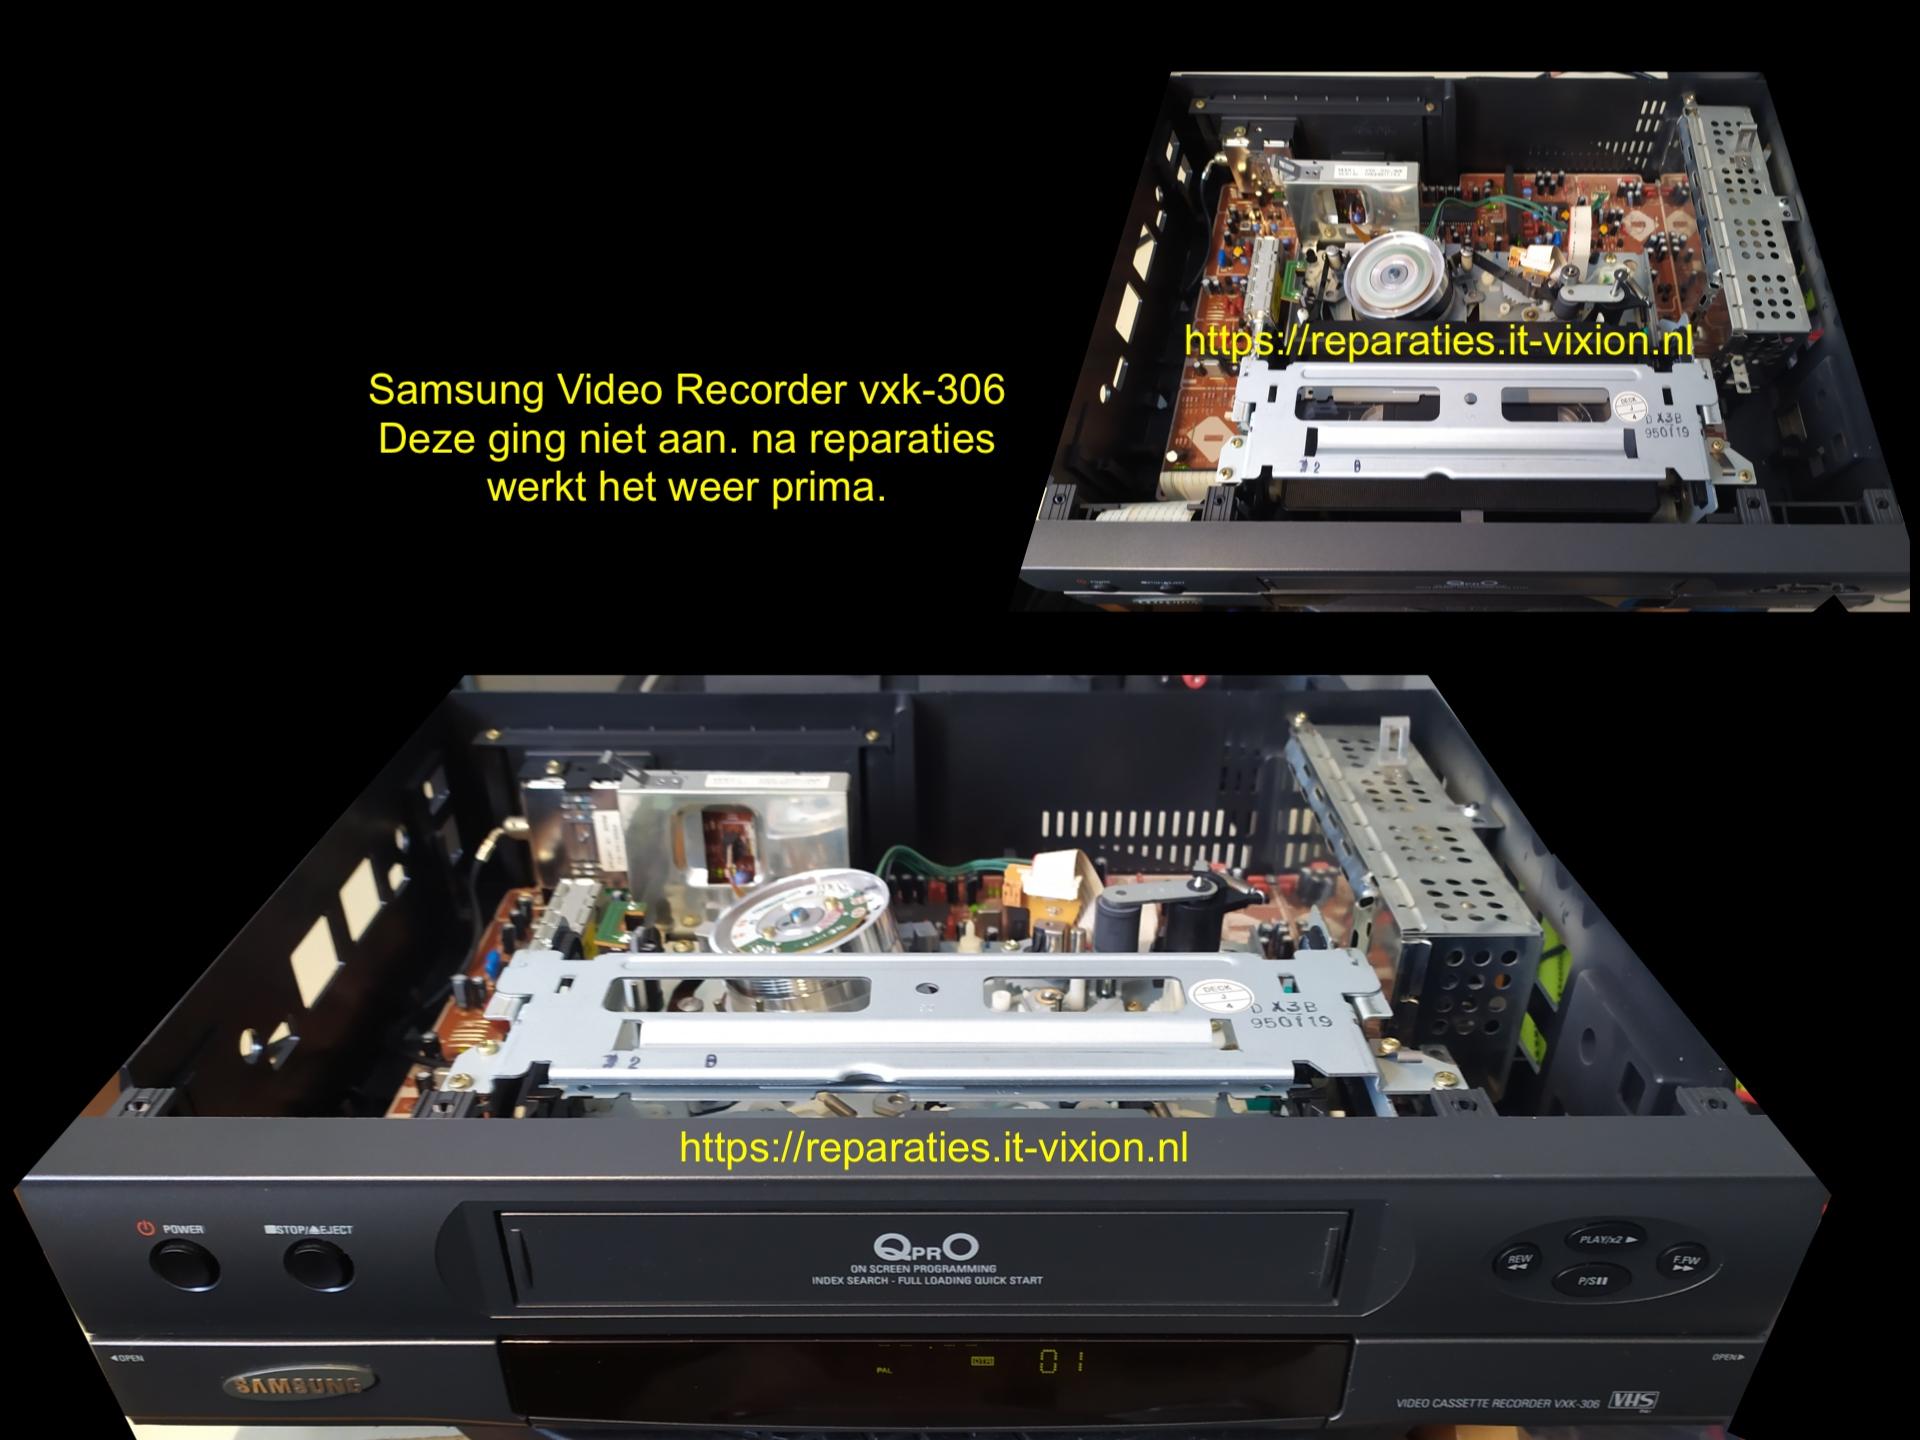 Samsung video recorder vxk-306